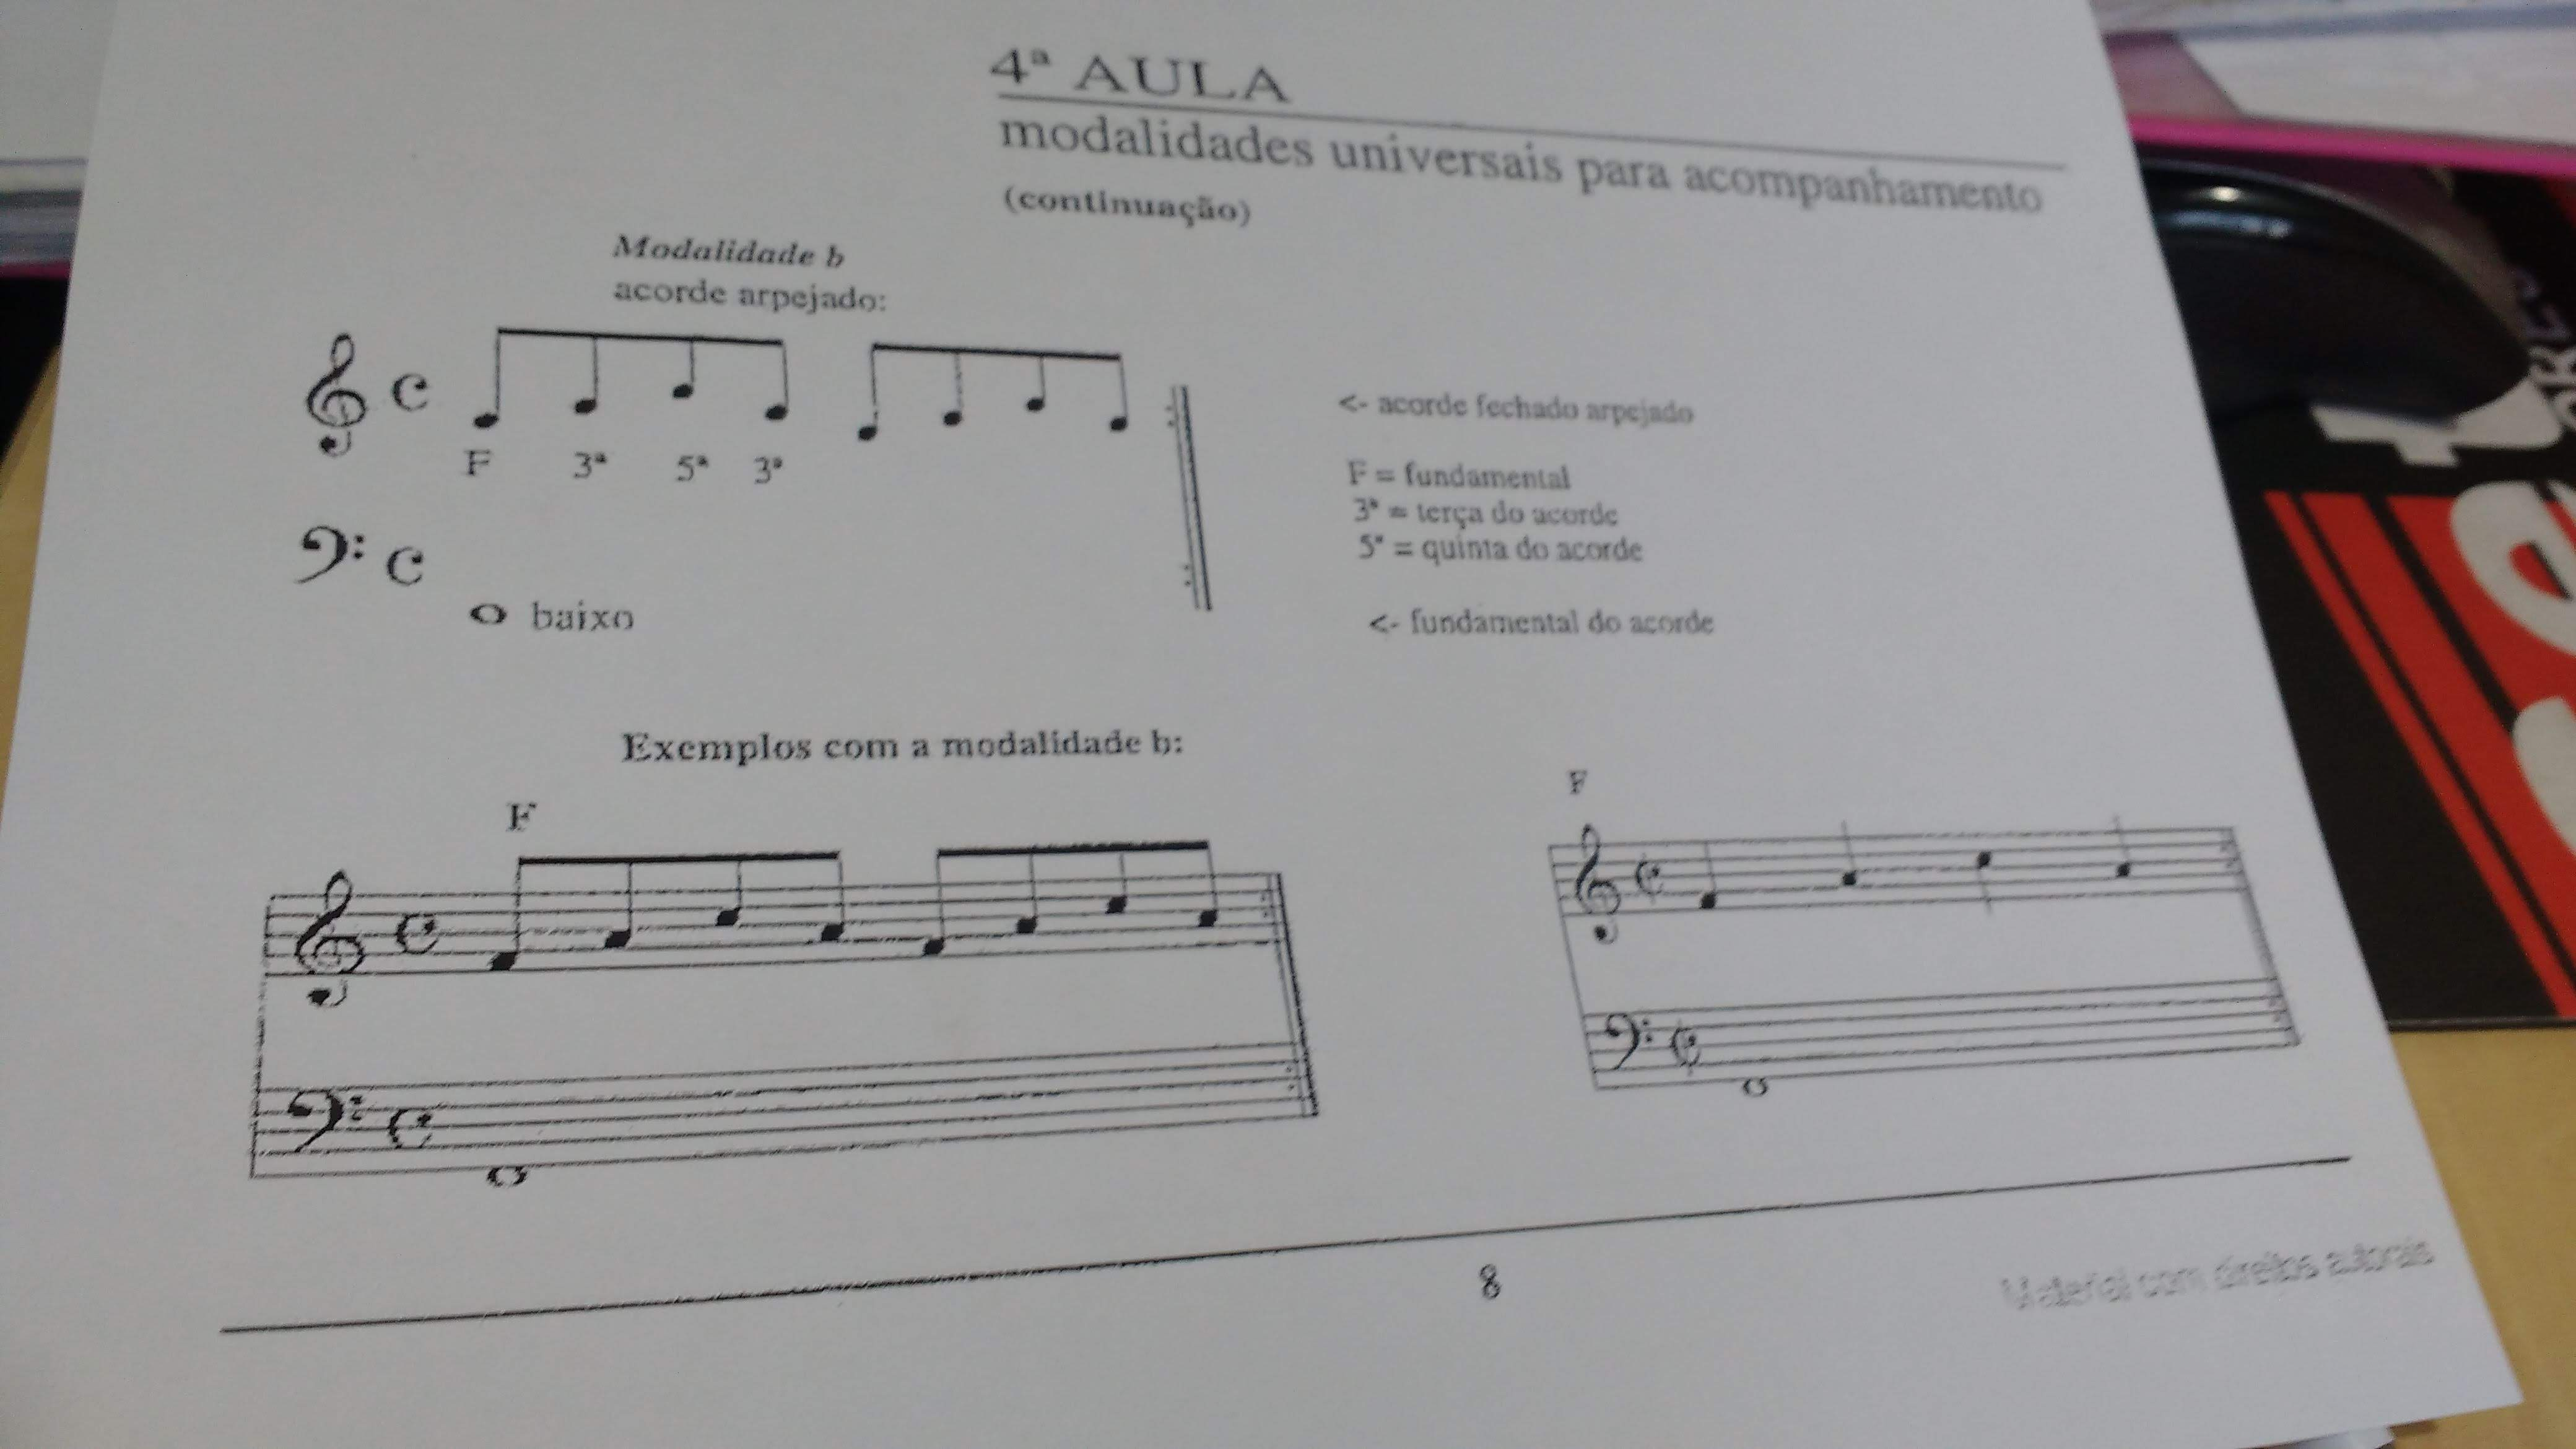 ritmos teclado aulas de musica melhor idade jf contato escola de musica luciane borges professora de teclado 32-3223-8063